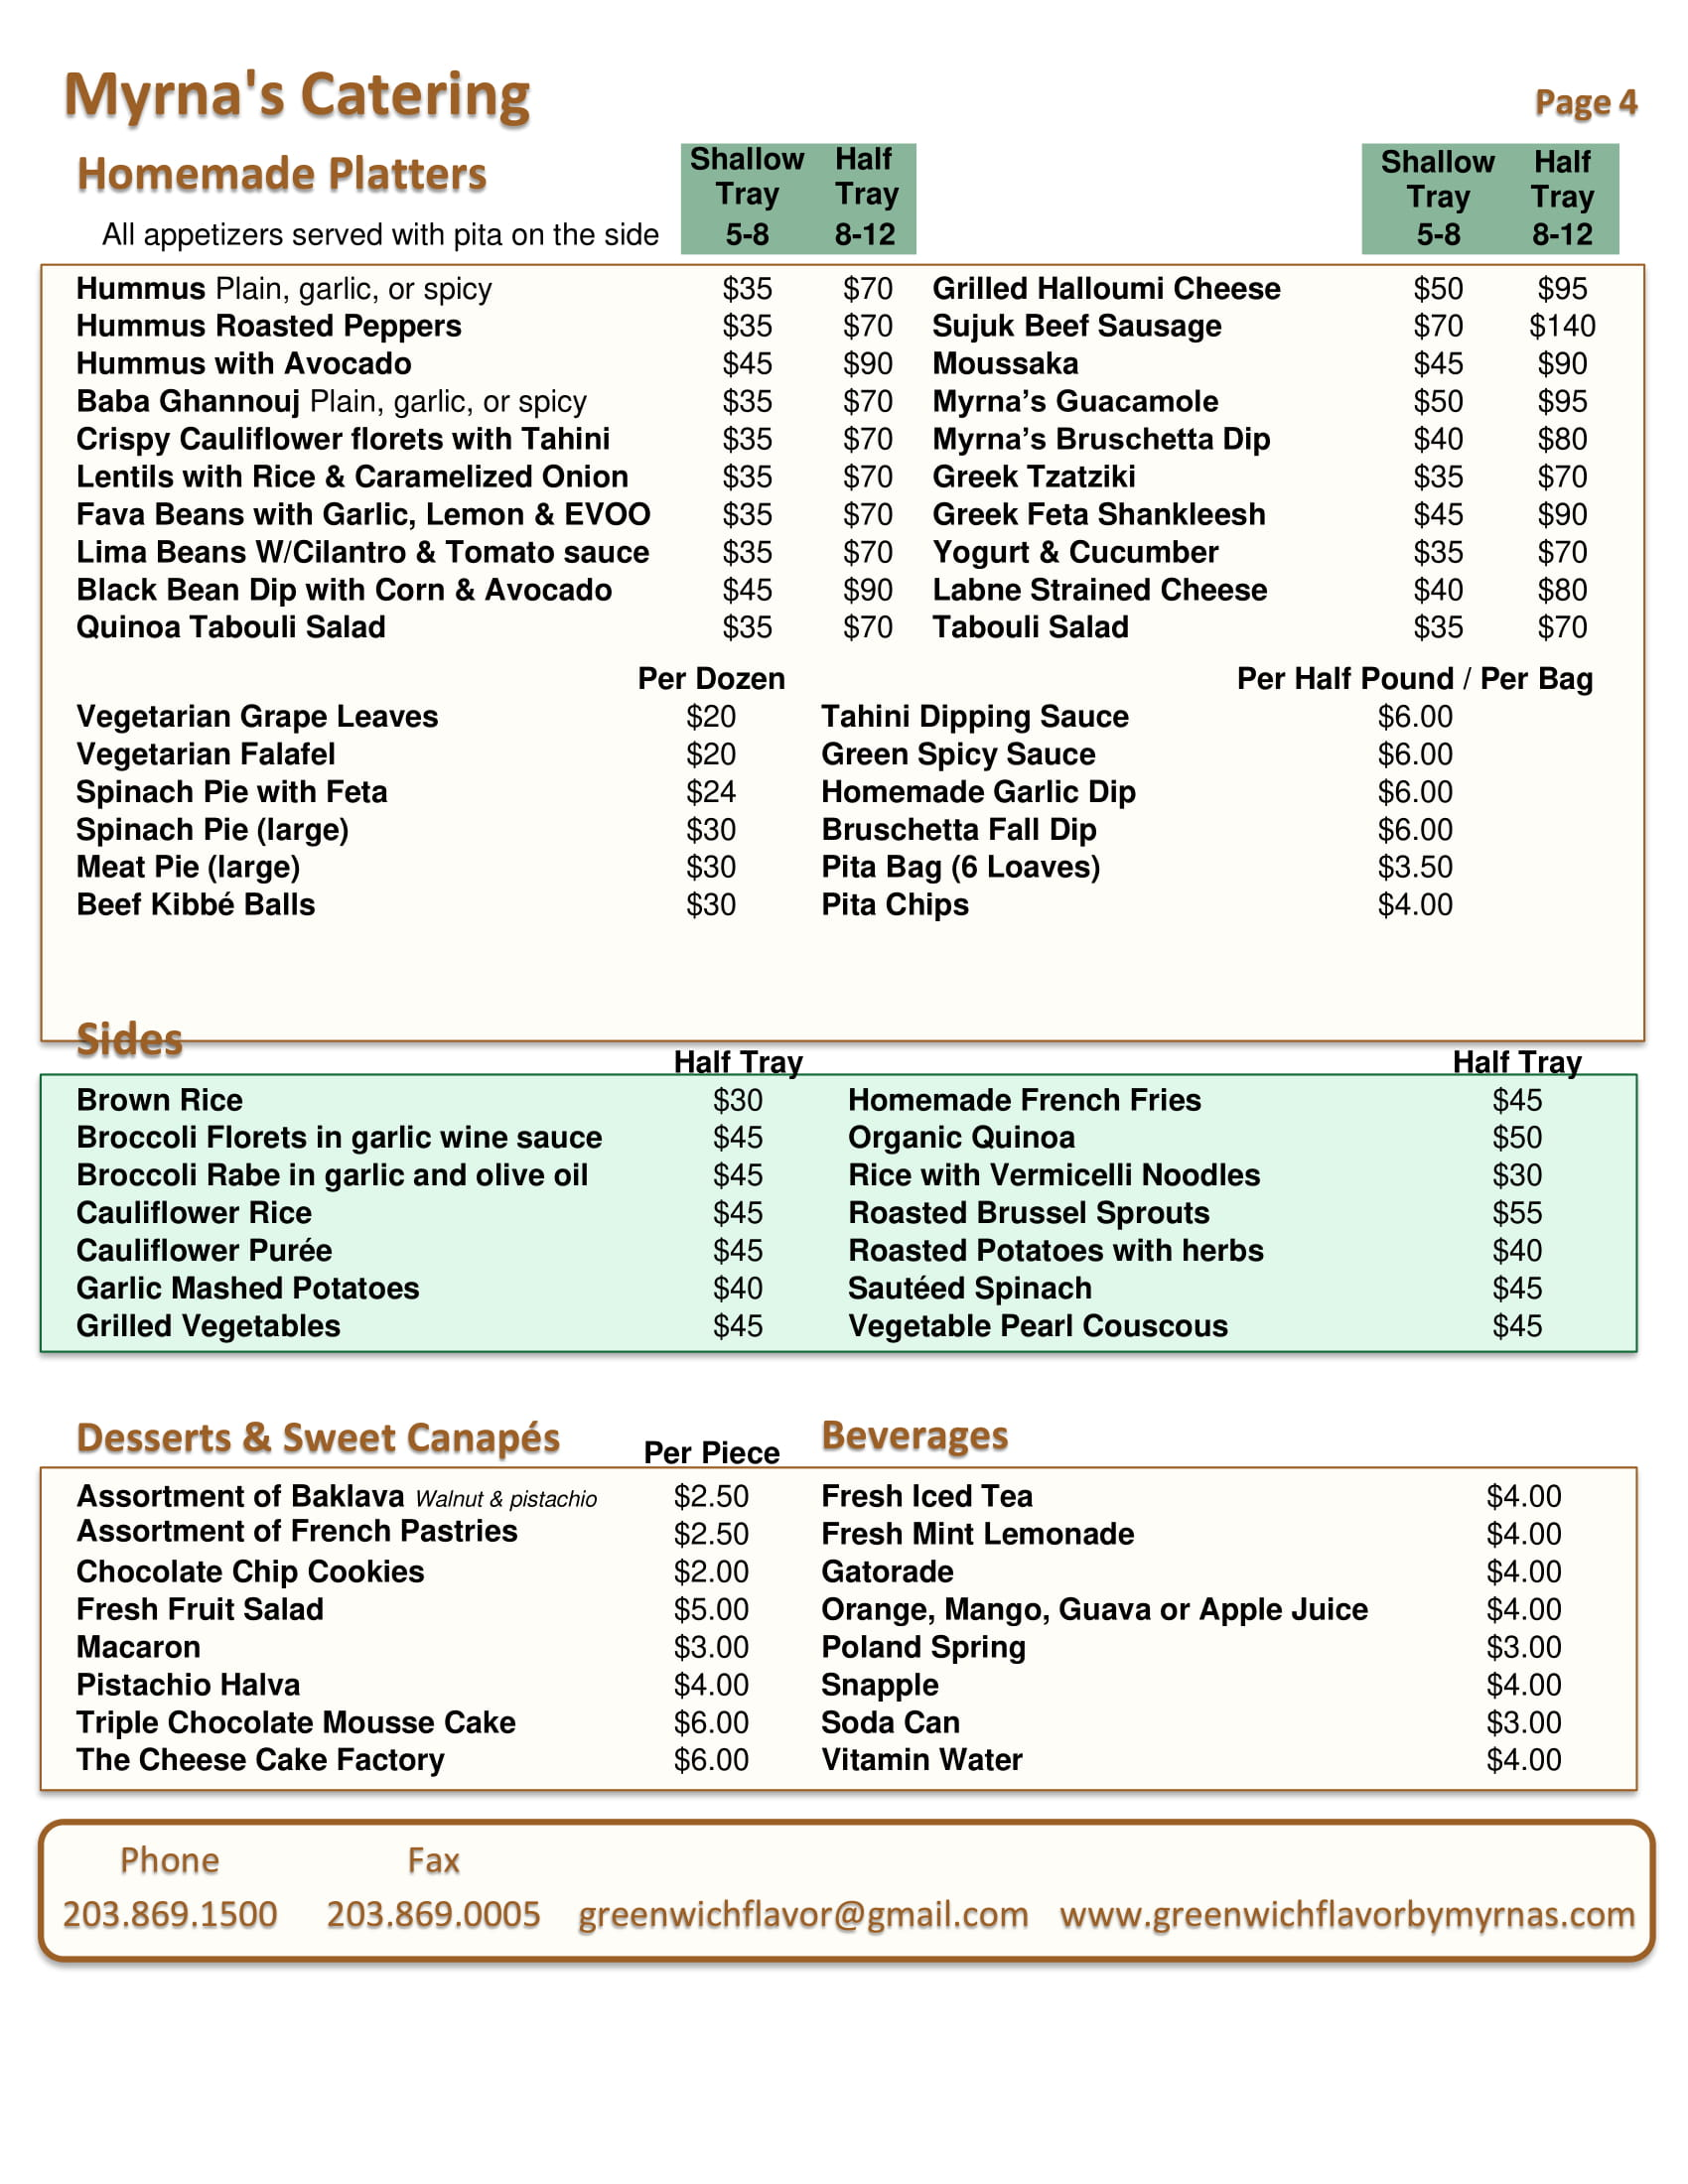 Online Catering Menu Of Greenwich Flavor by Myrna's